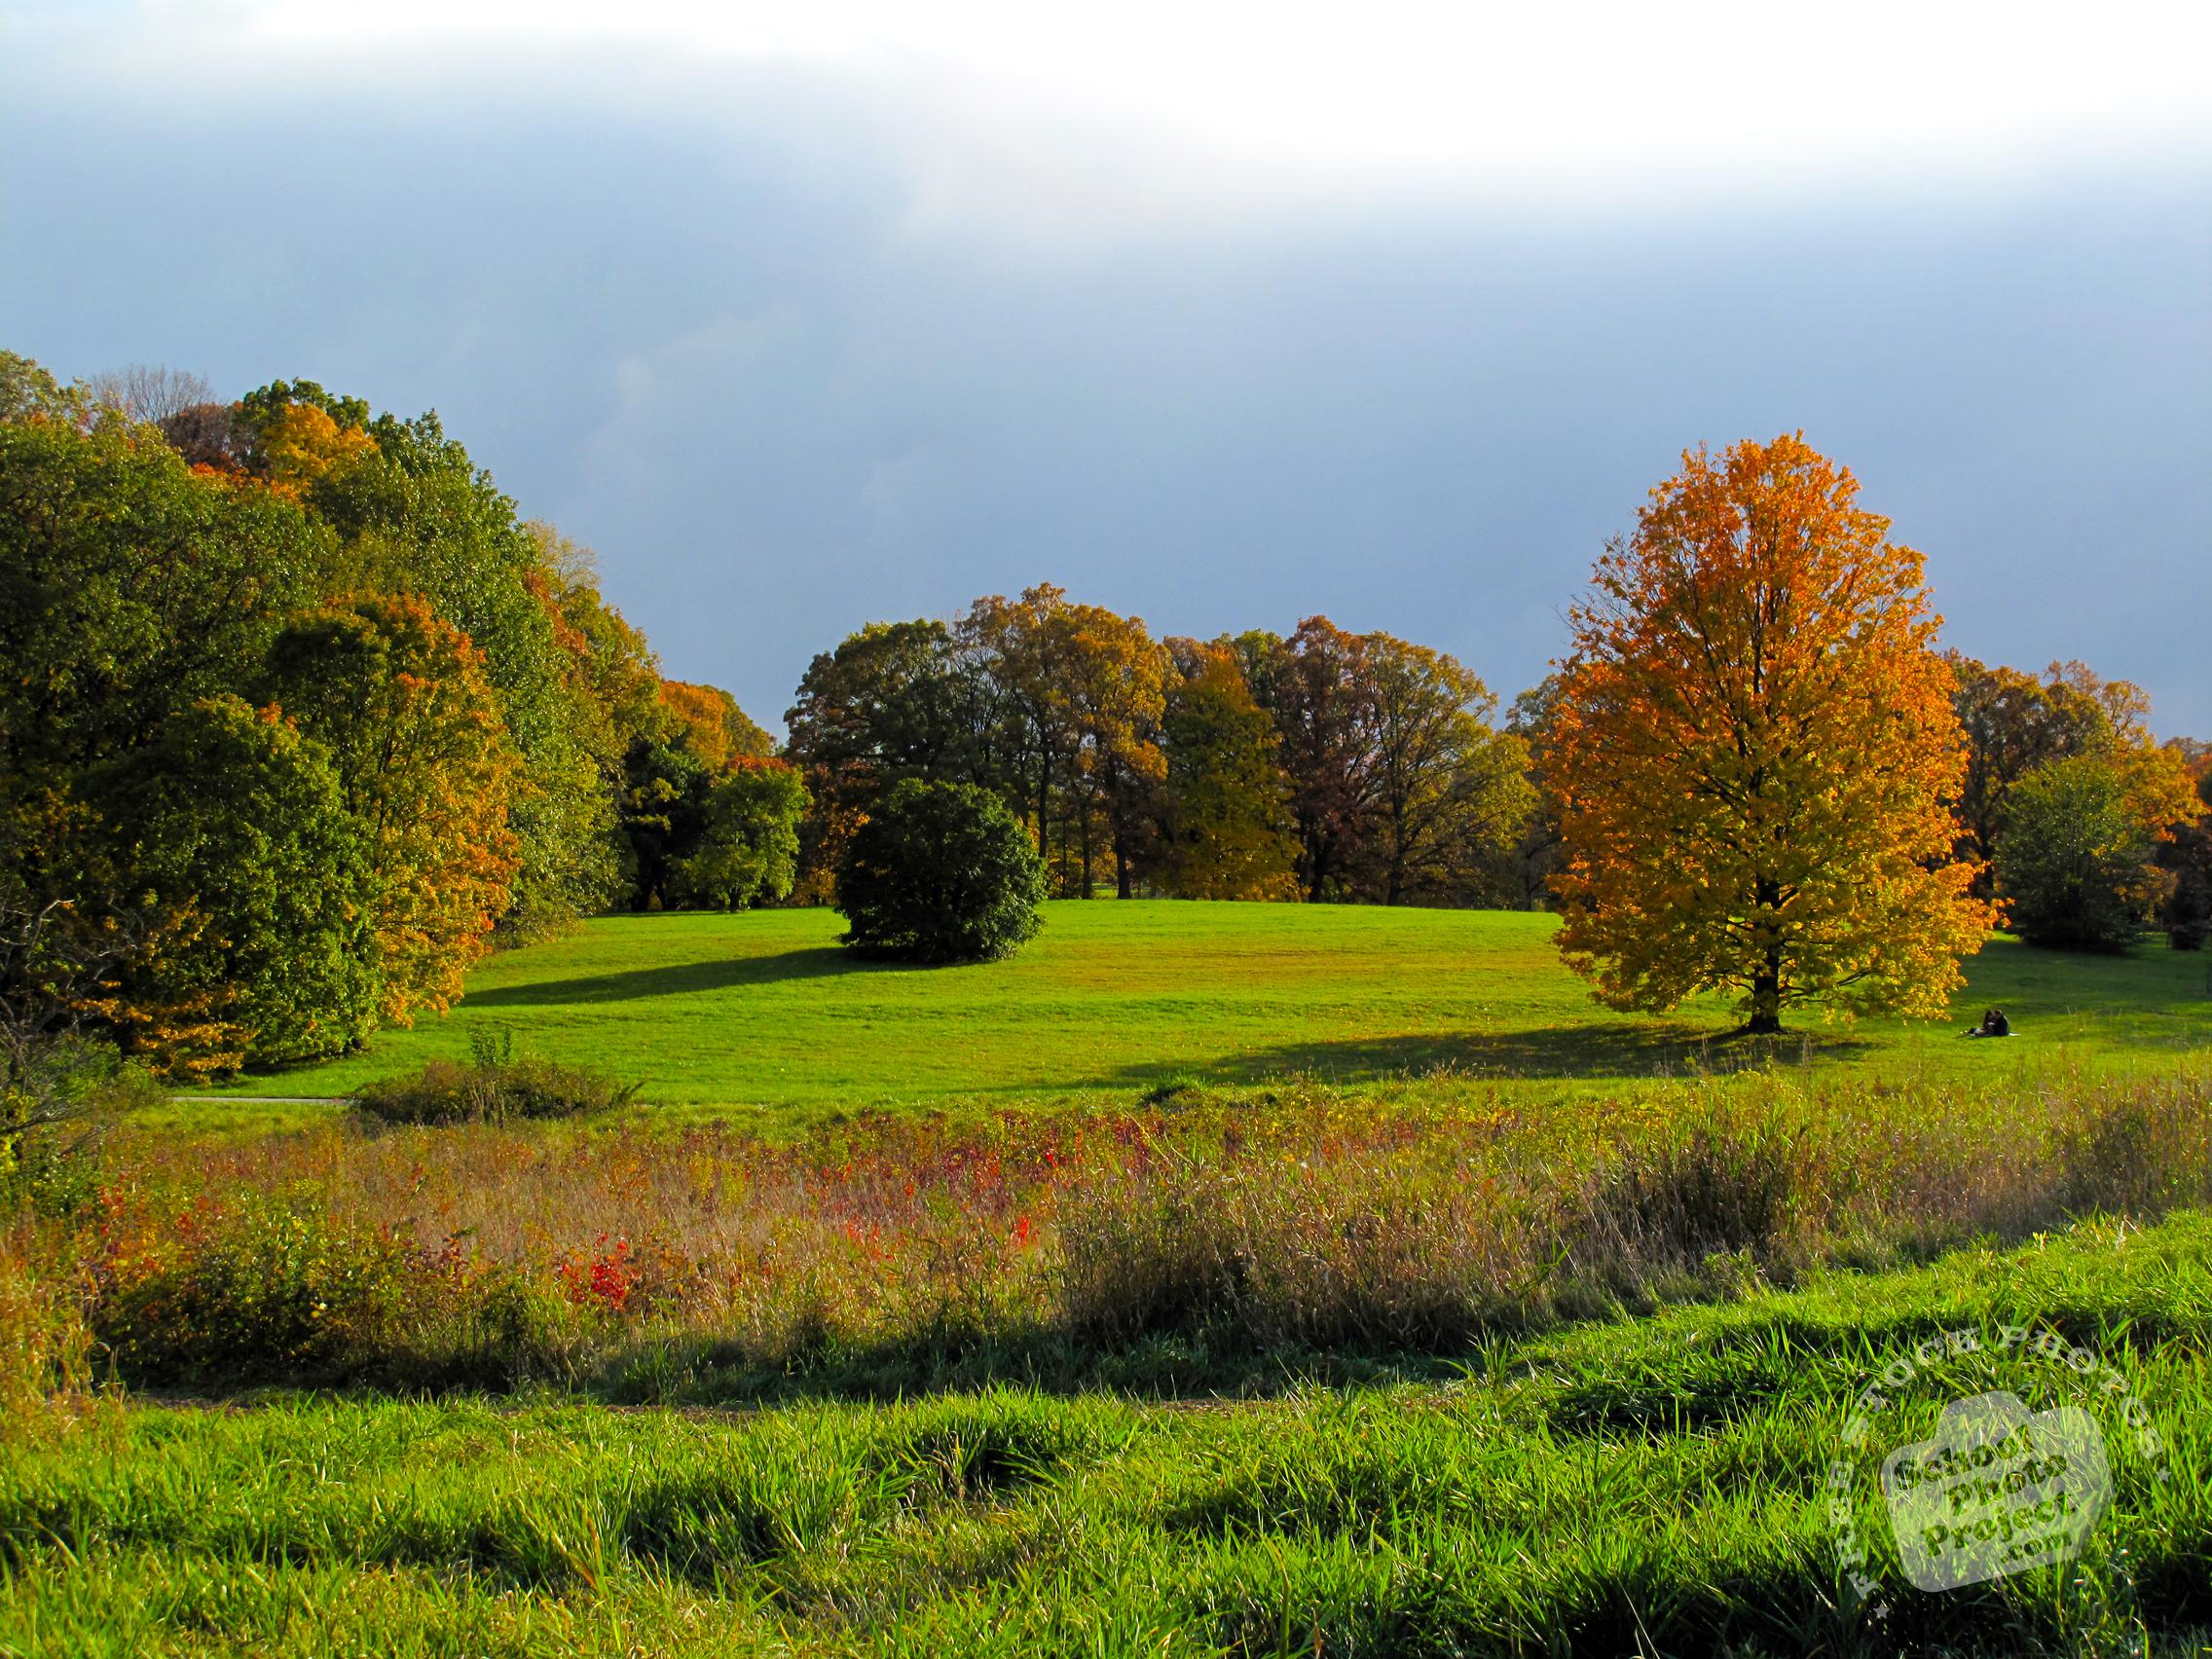 FREE Autumn Scenery Photo, Fall Foliage Picture, Beautiful Panorama ...